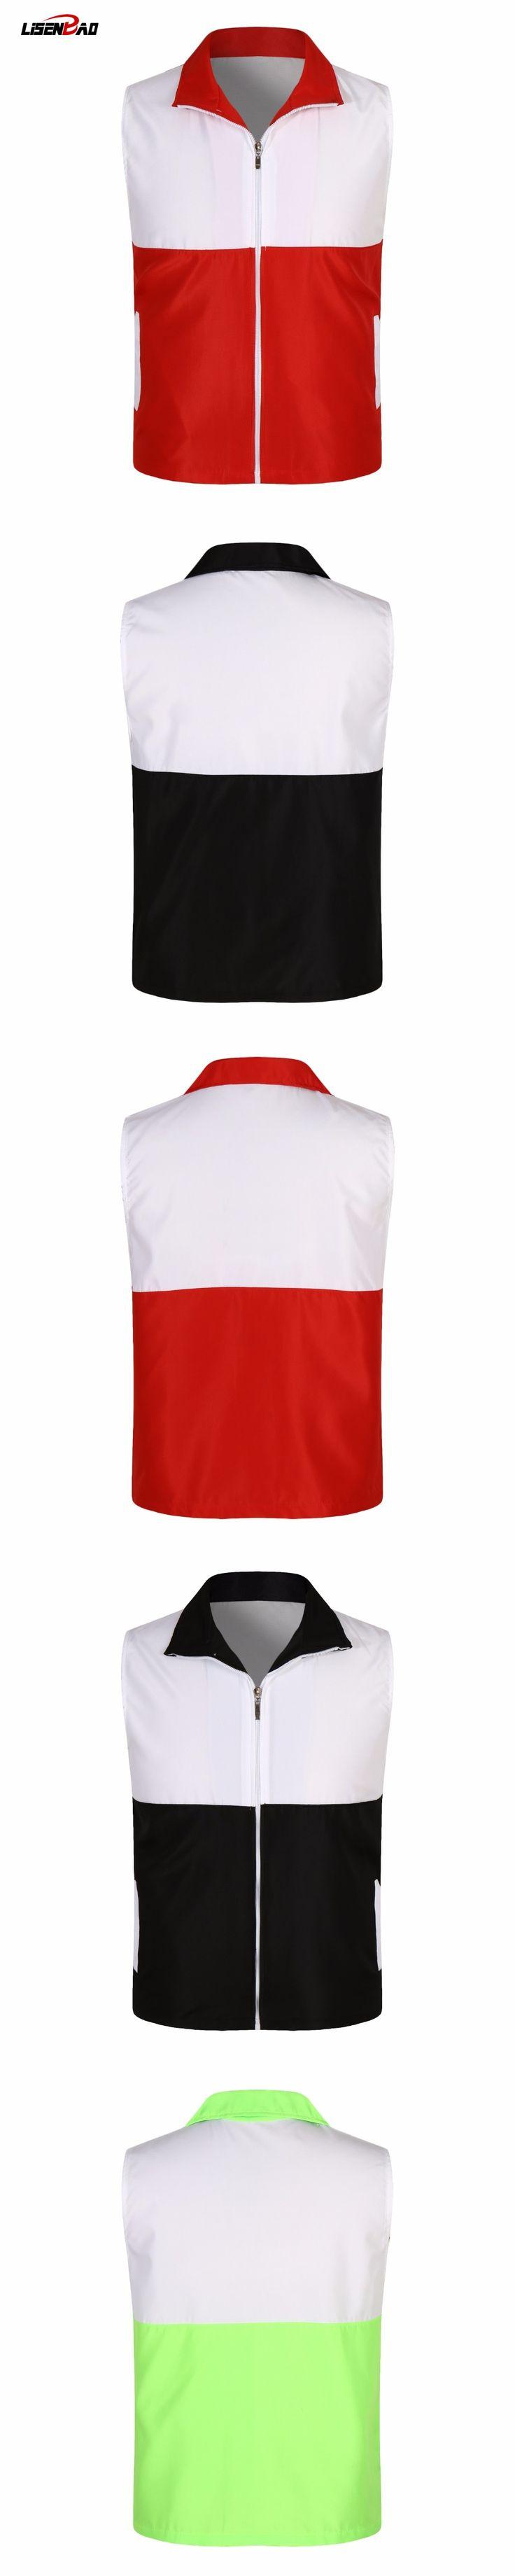 2017 New Arrival Brand Men Sleeveless Jacket summer Casual Vest Slim Men's Vest  Splicing thin section Waistcoat Mens Jacket